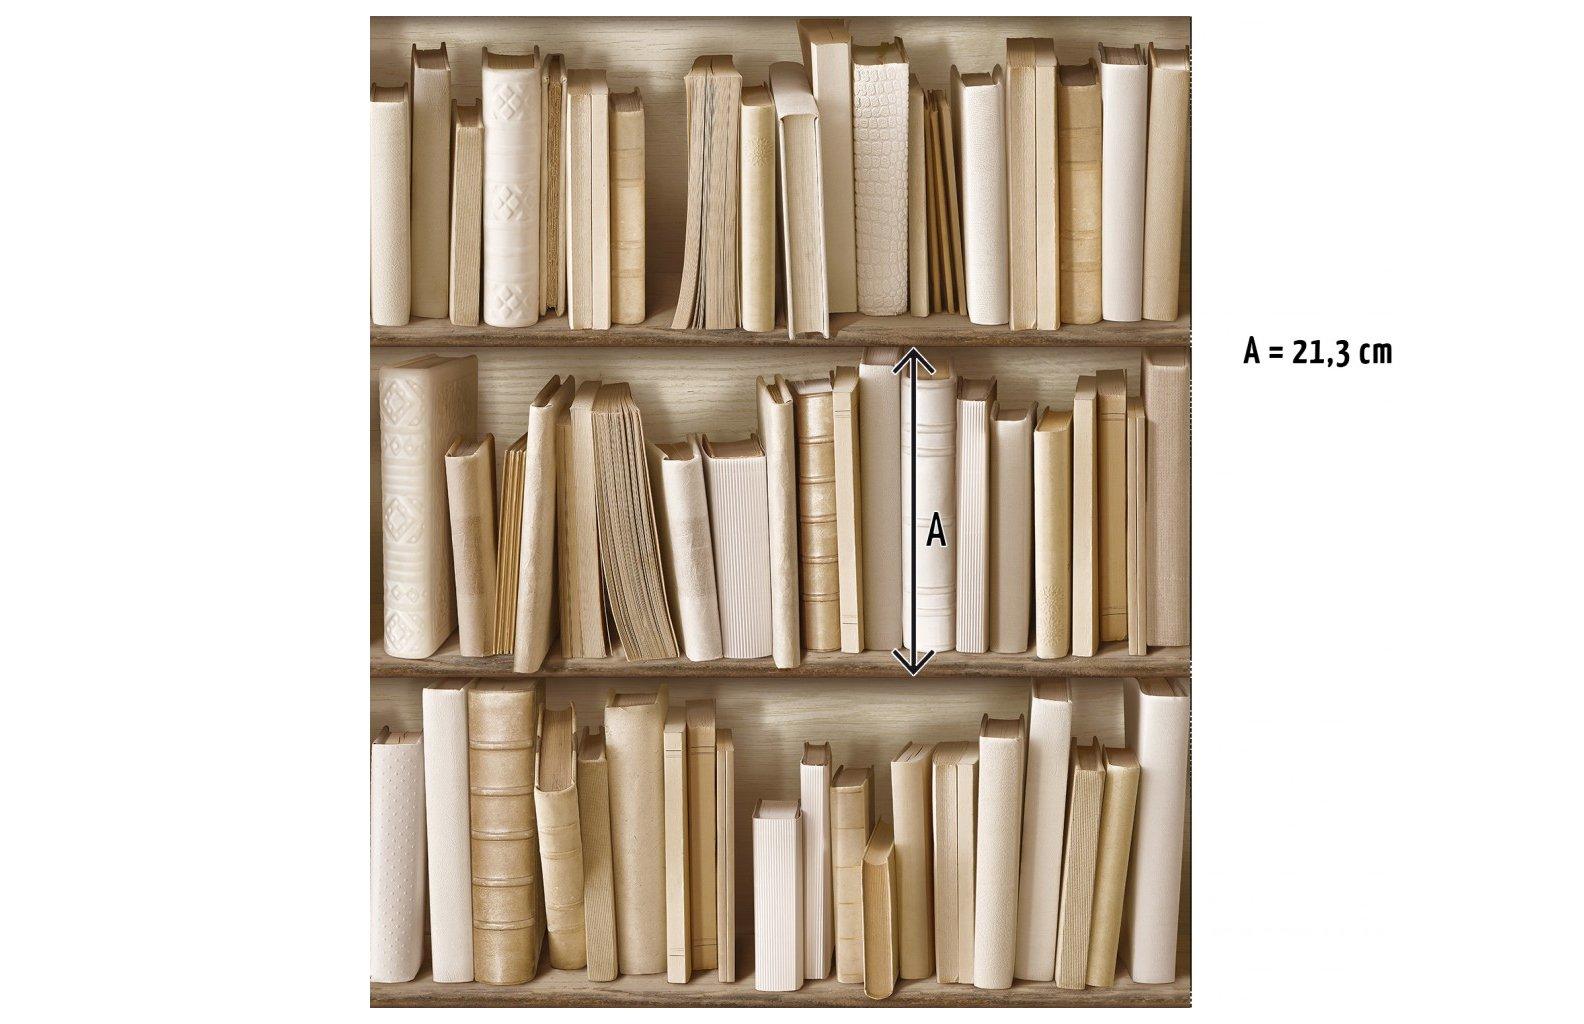 Papel pintado biblioteca marfil by Koziel